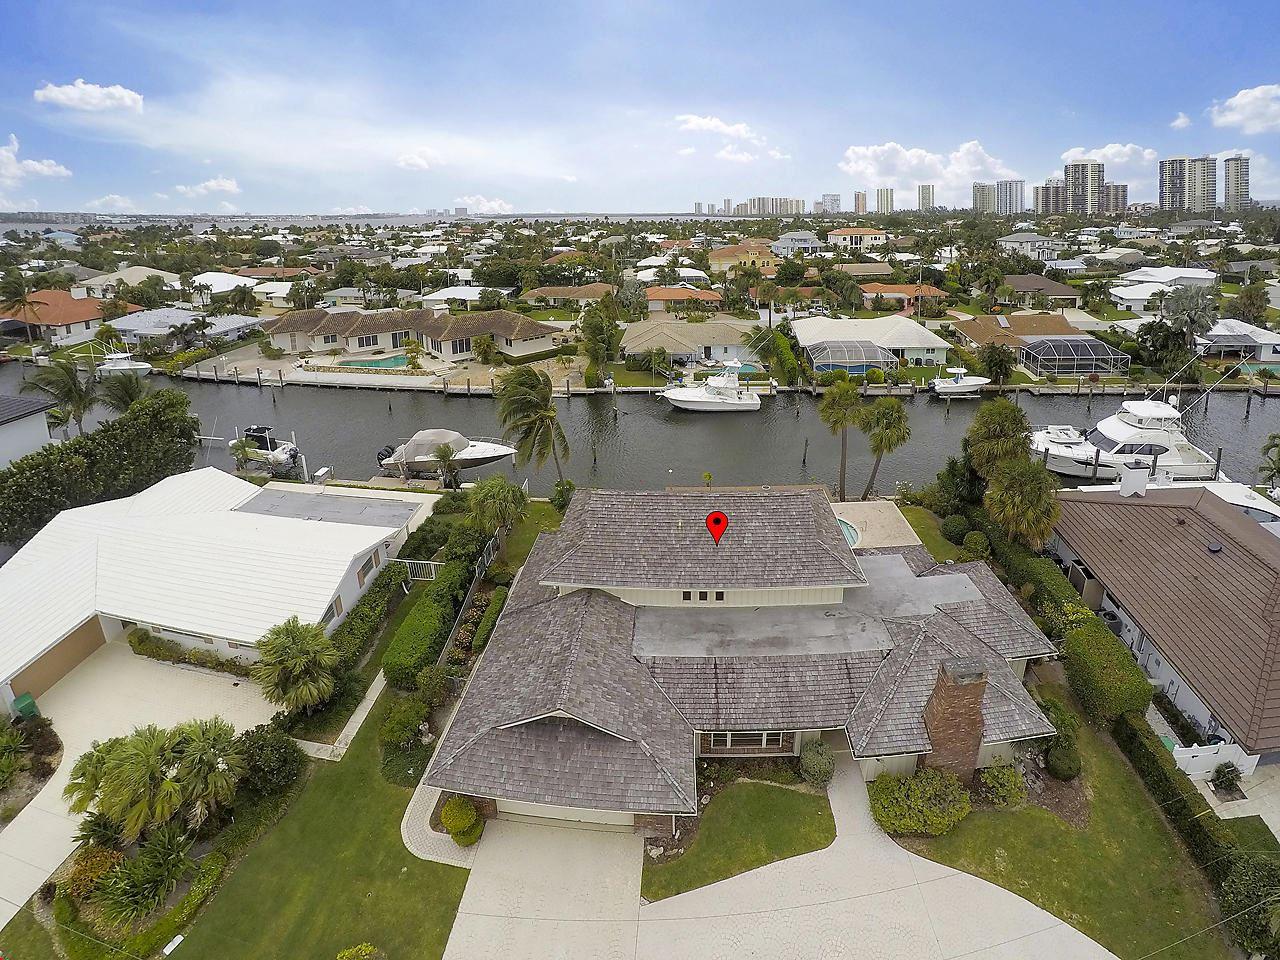 Photo of 1110 Powell Drive, Singer Island, FL 33404 (MLS # RX-10672808)